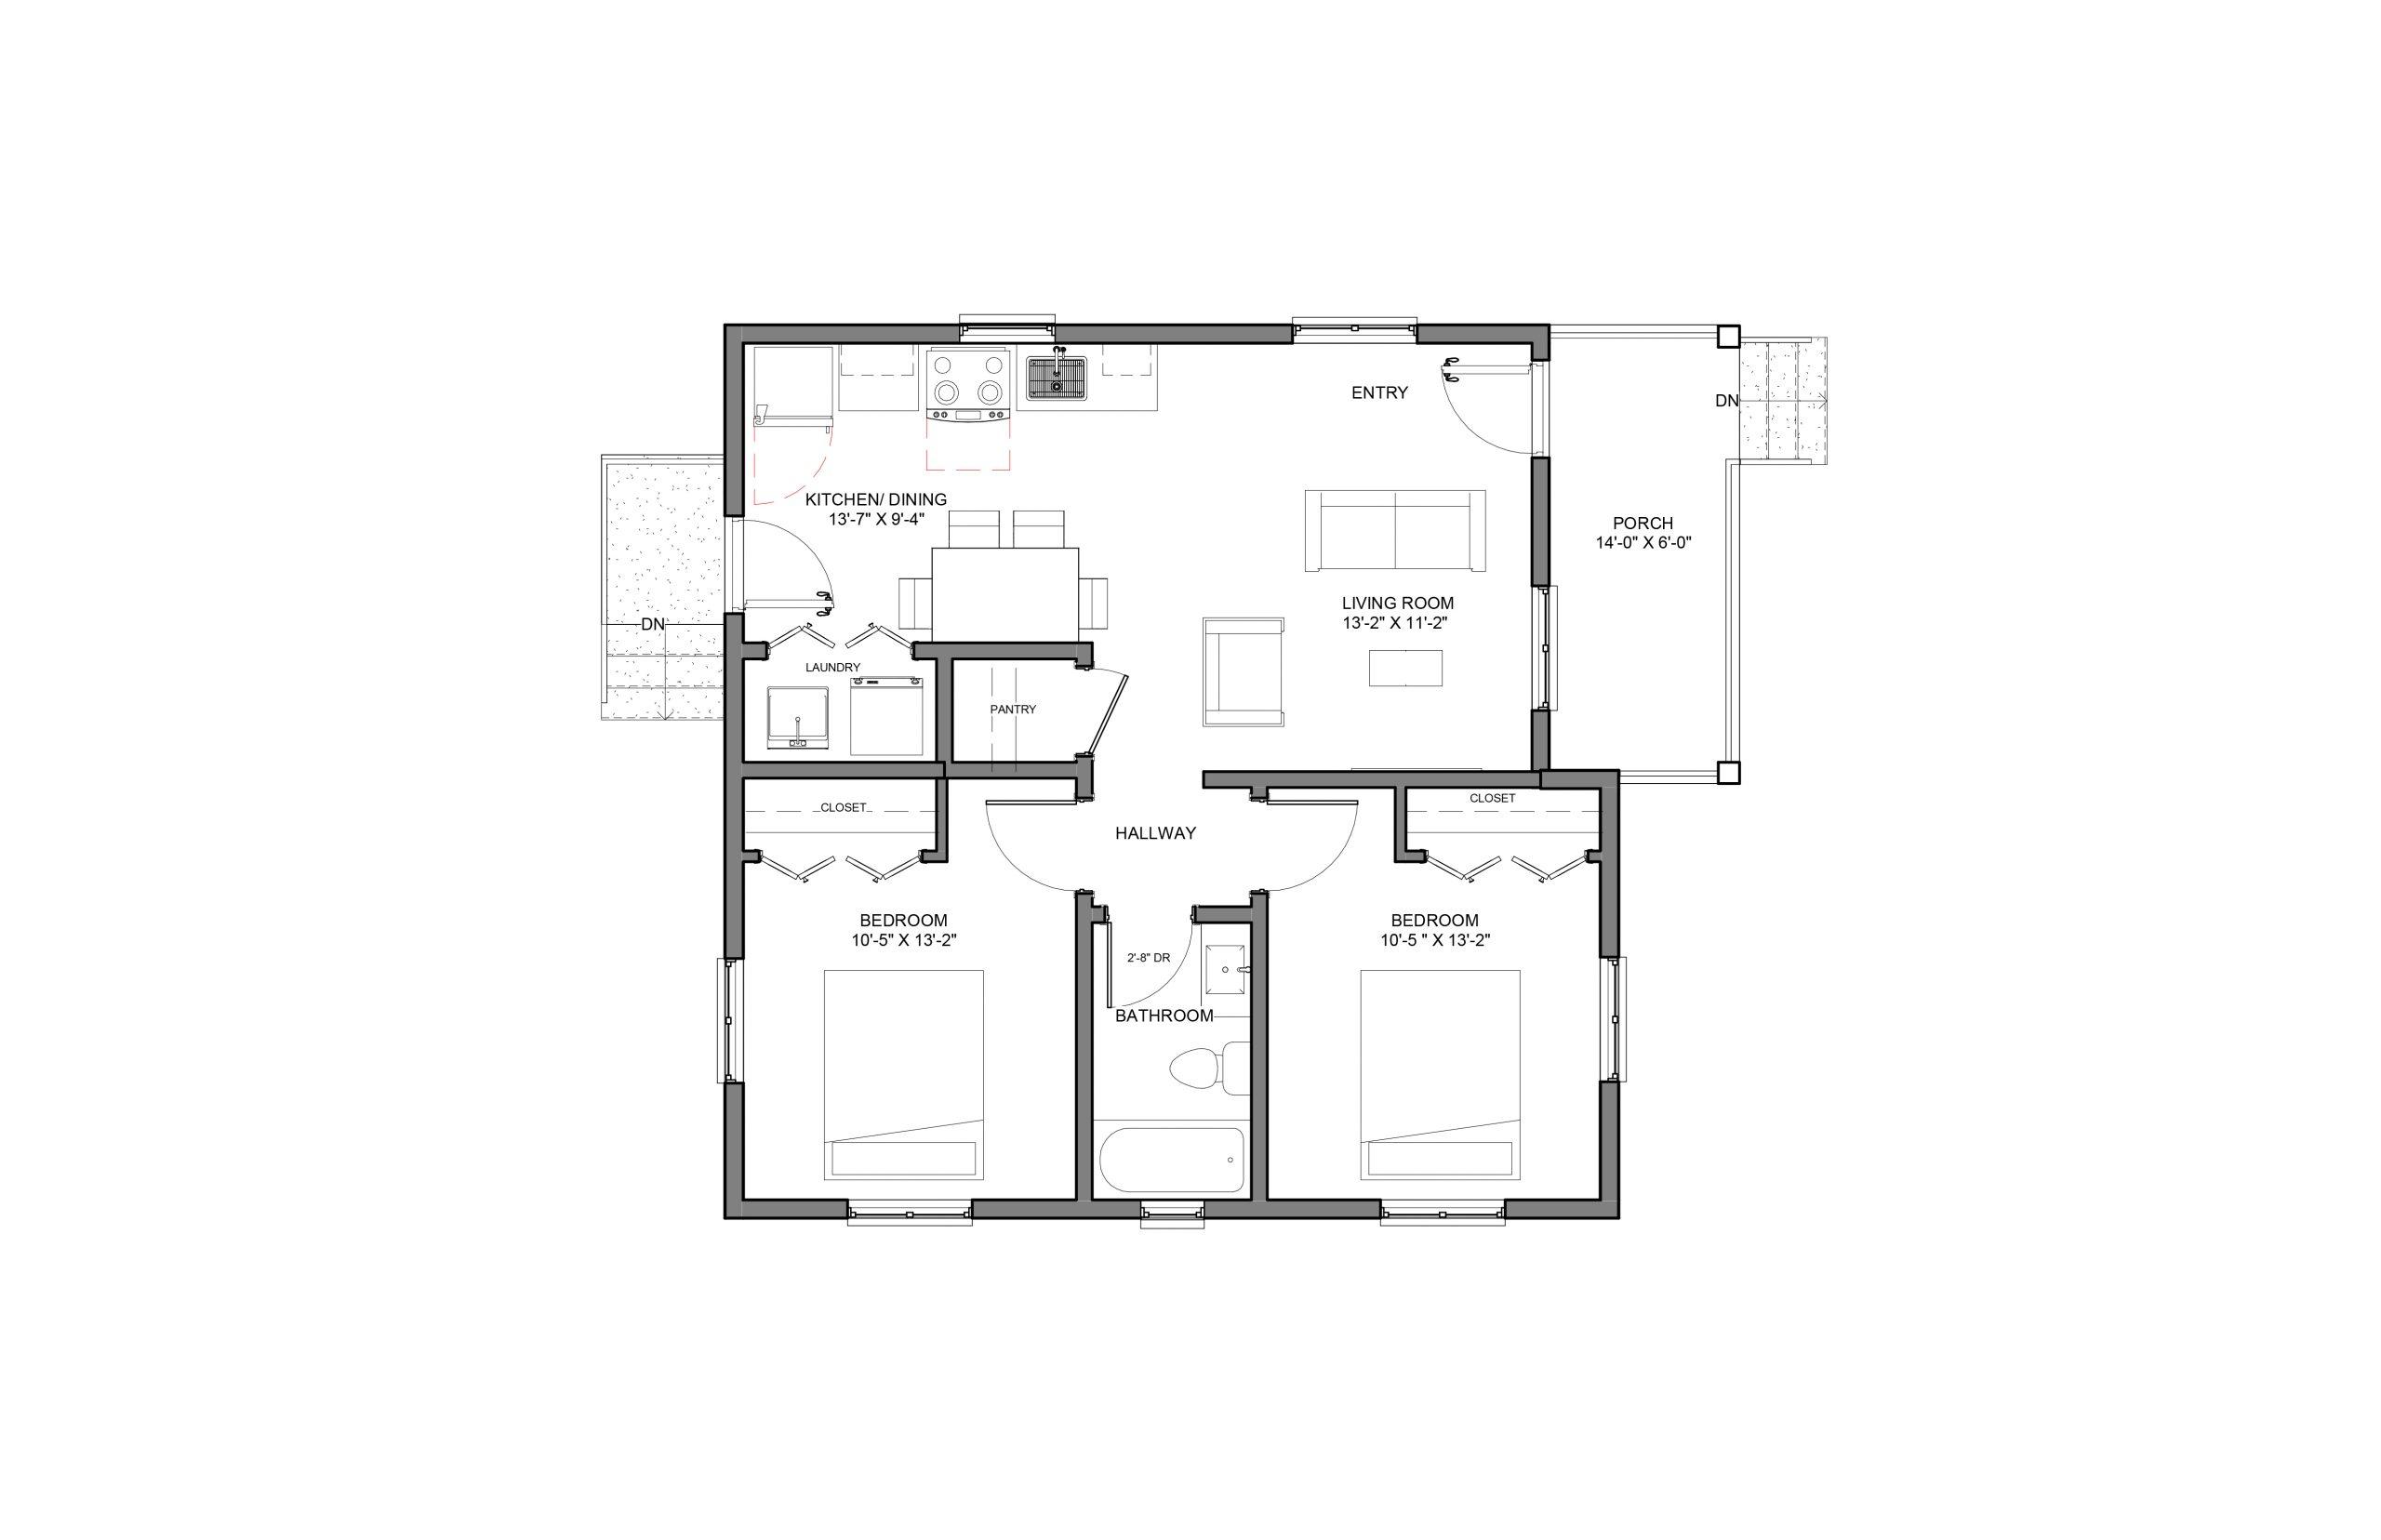 Torch 2Bed 1Bath Option 2 Floor Plan 850+SQFT